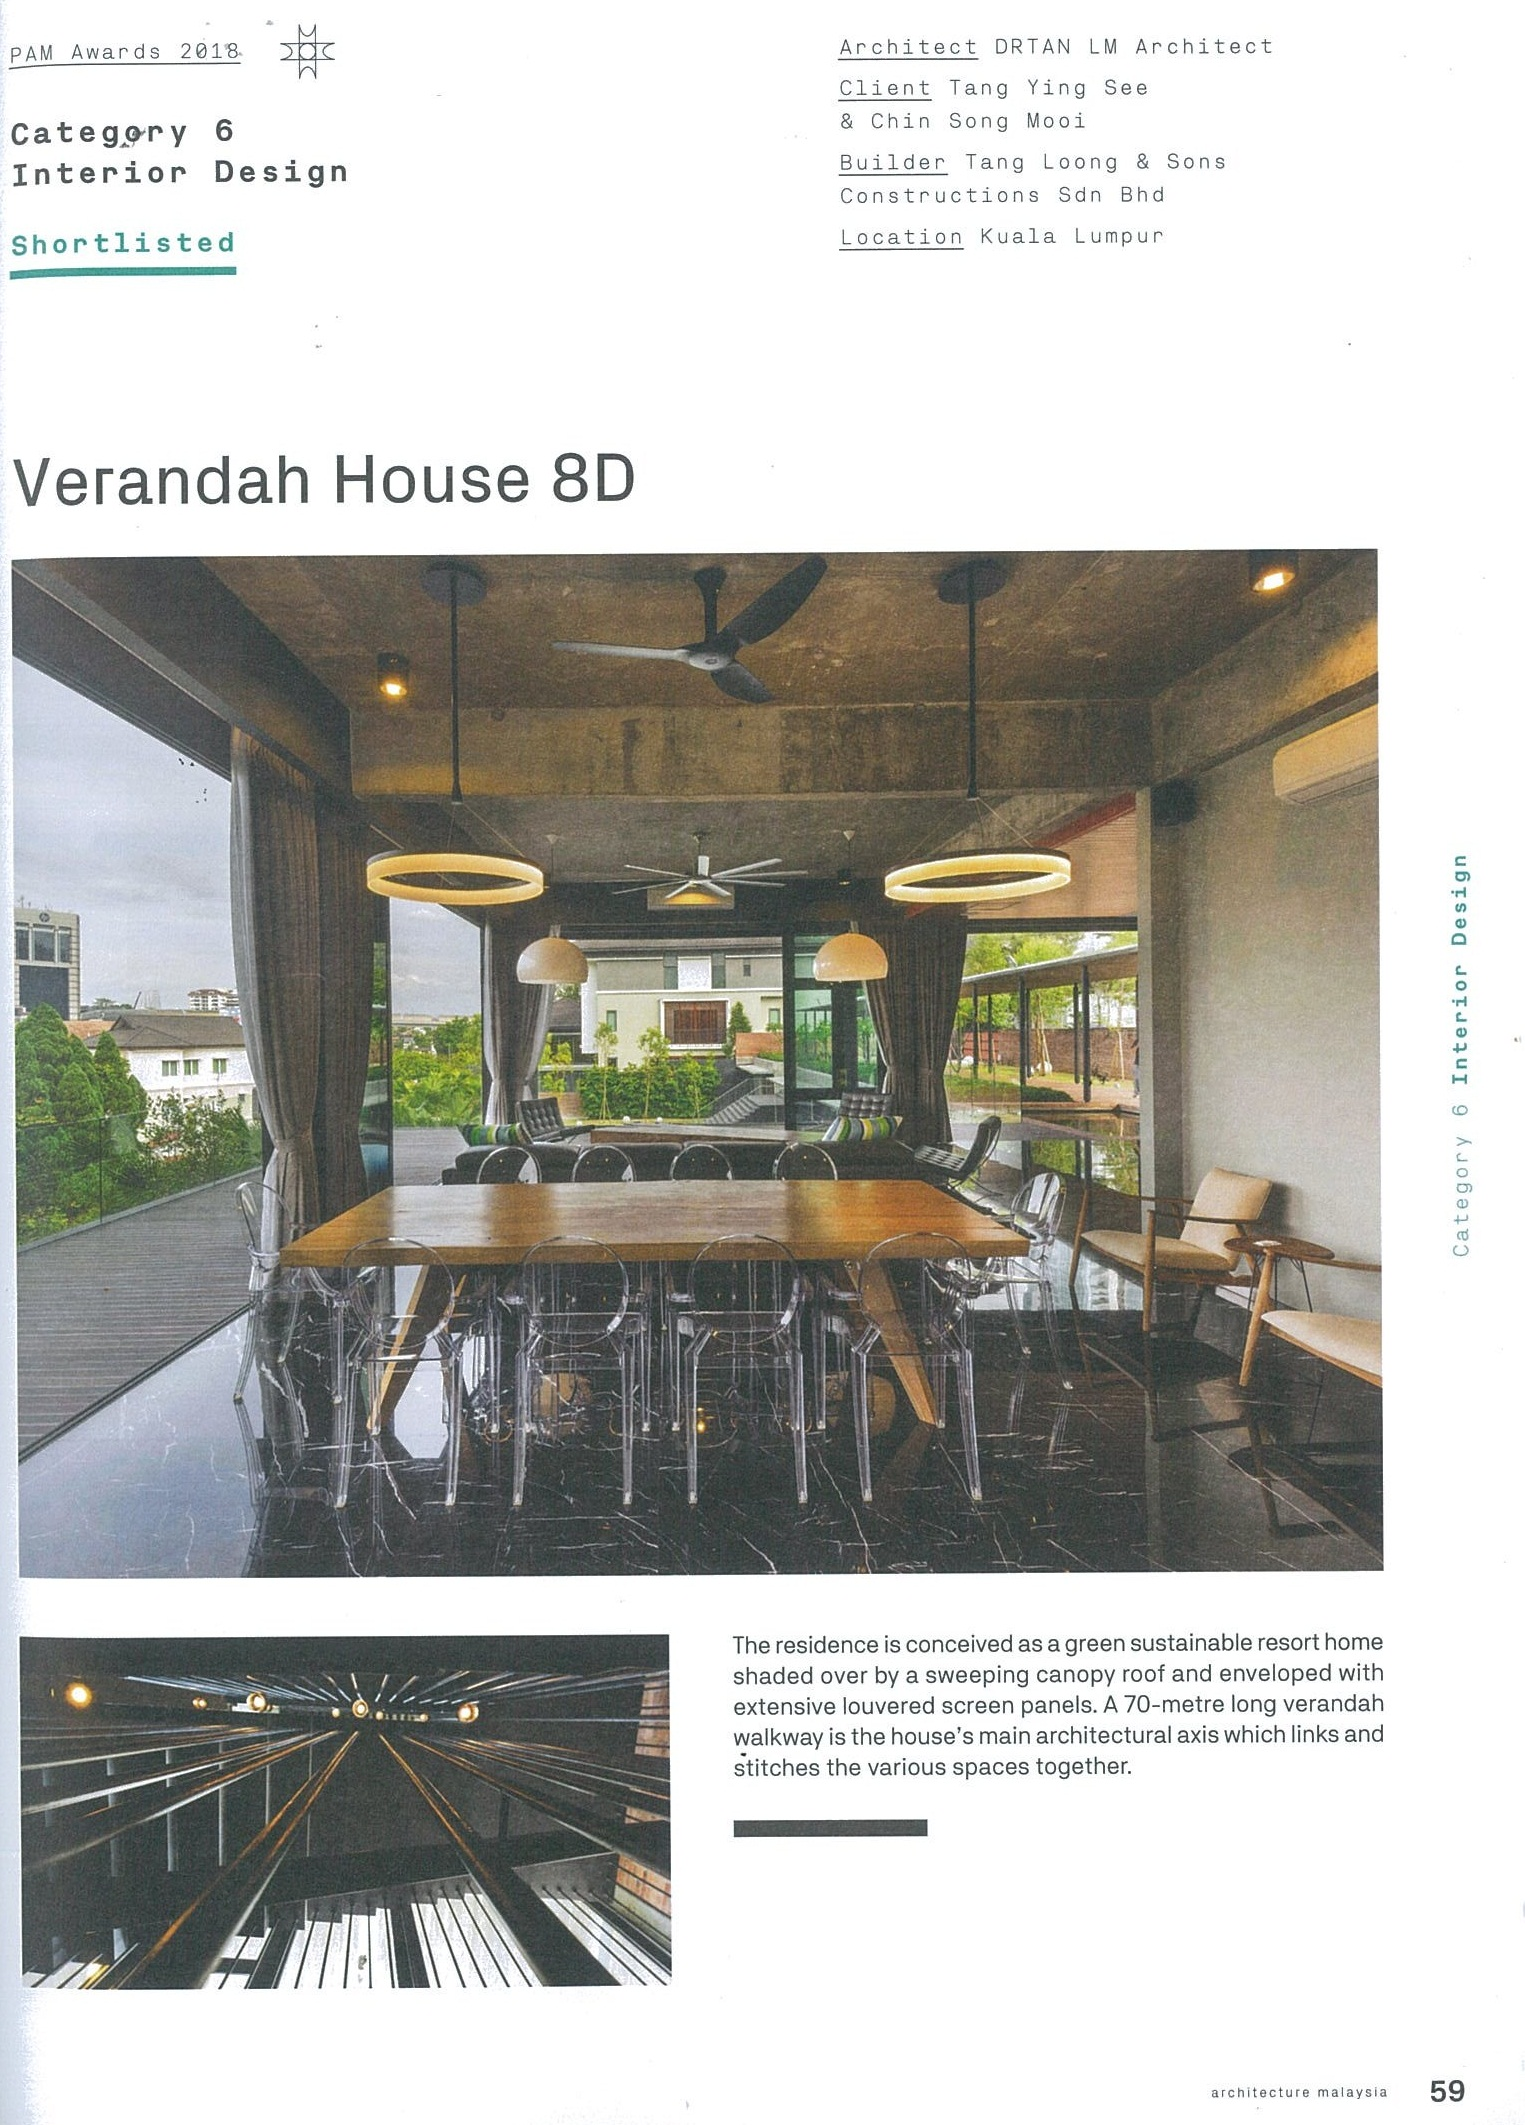 Verandah House 8D